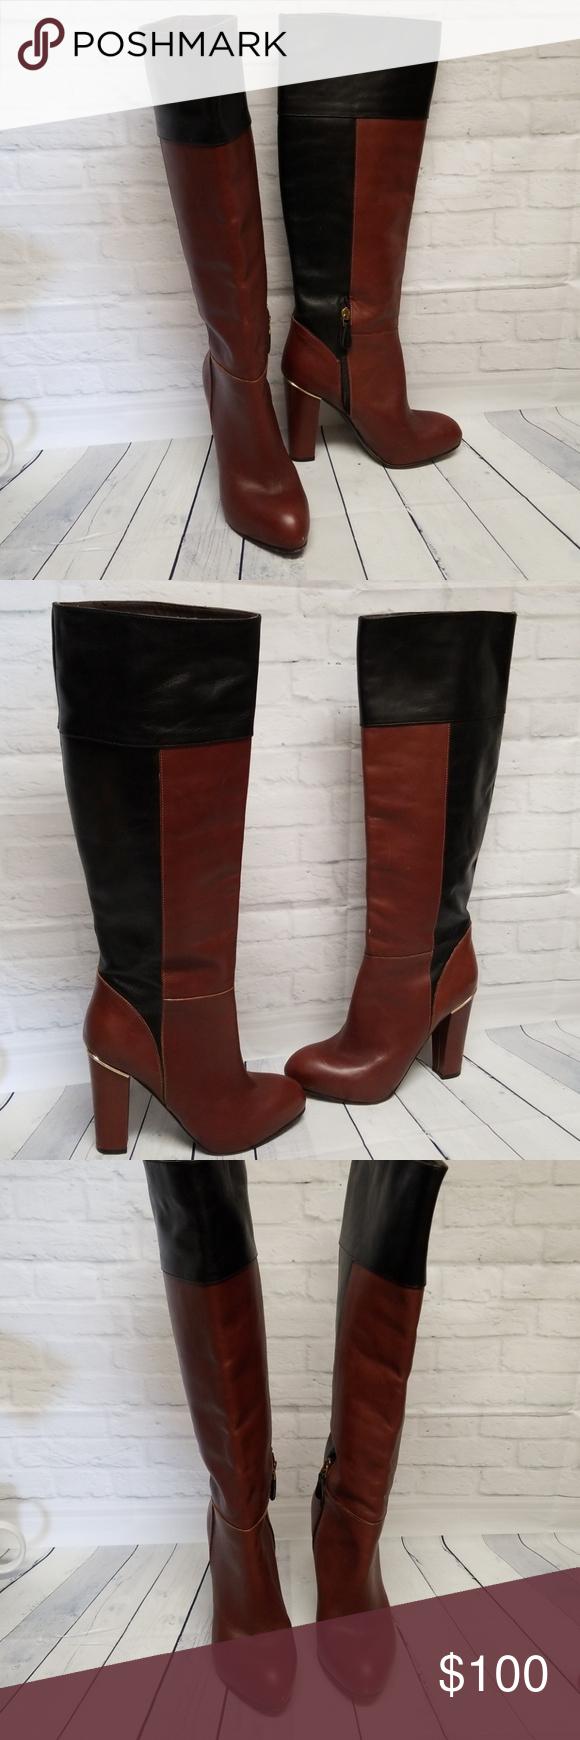 fa591f12e11e1 Vero Cuoio Boots Good used condition. See pics for wear. Vero Cuoio Shoes  Heeled Boots